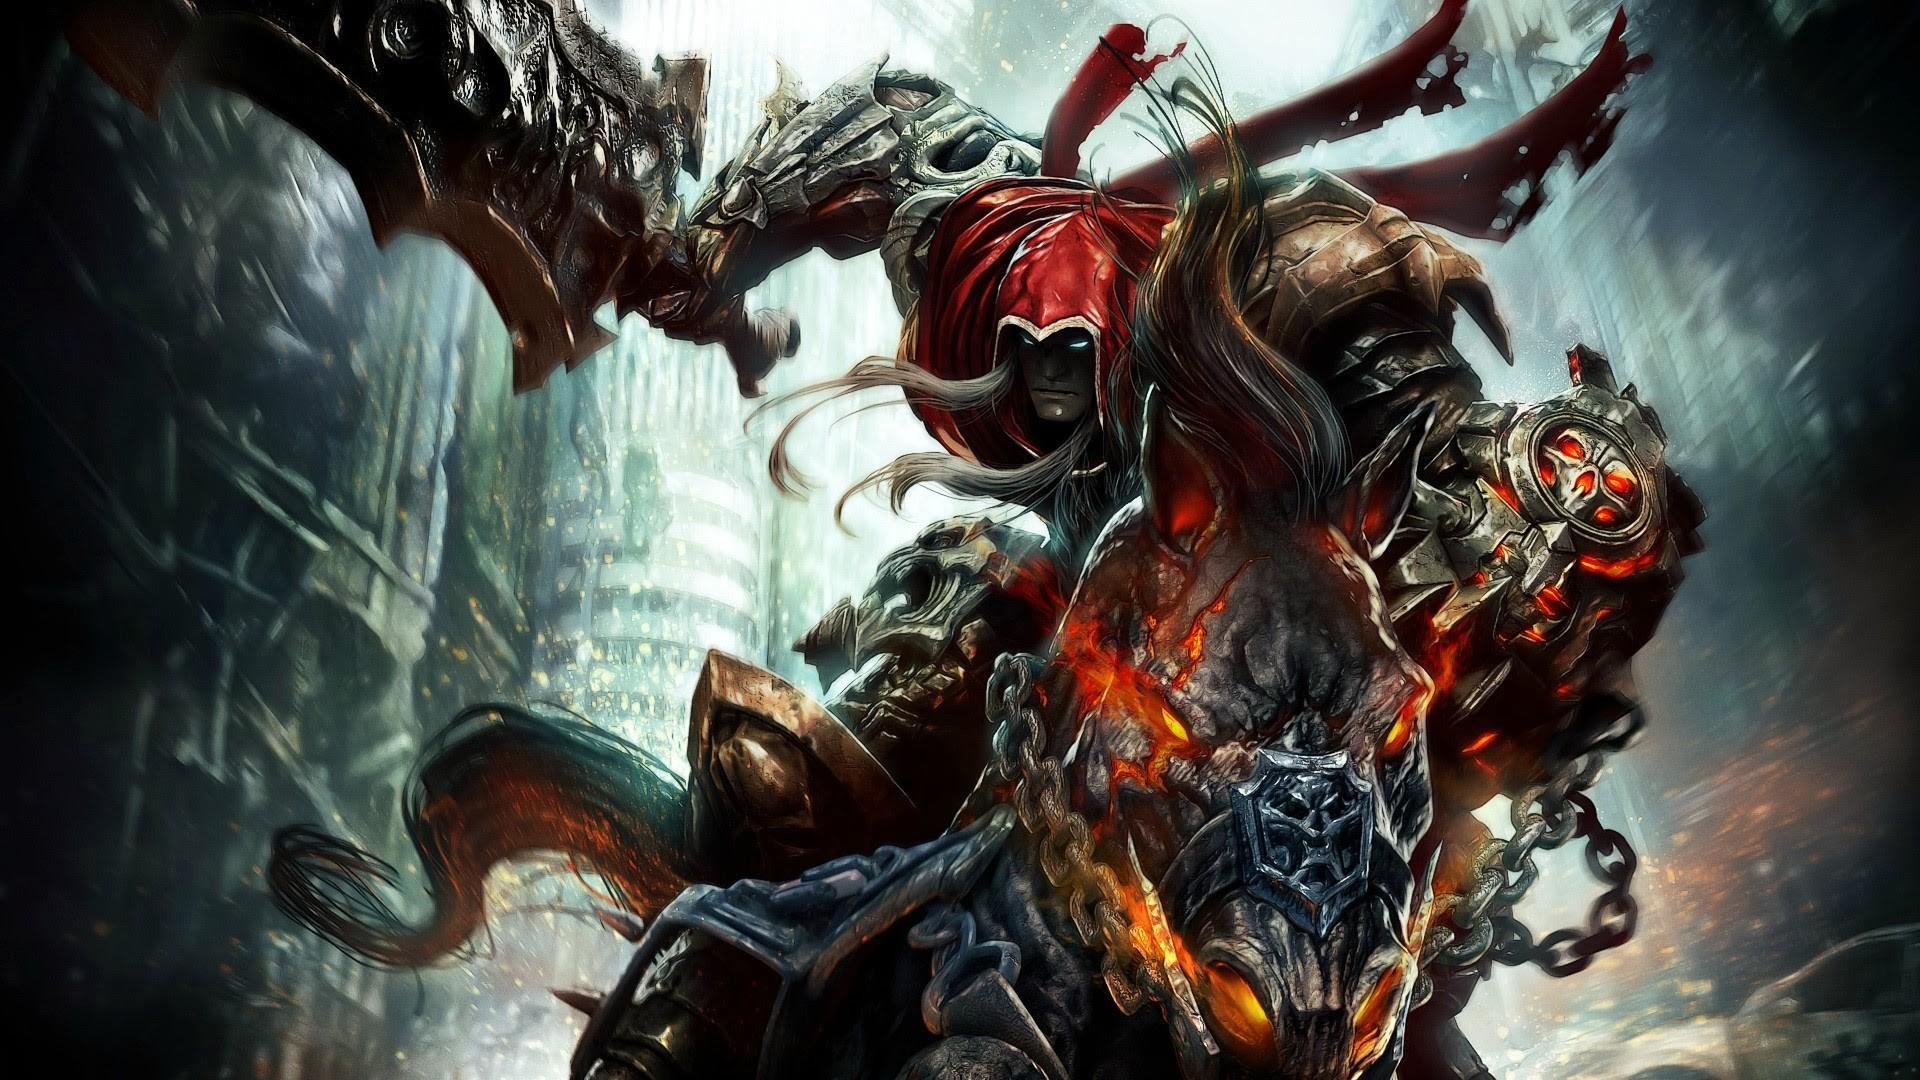 epic warrior riding flaming horse wallpaper hd fantasy weapon sword .